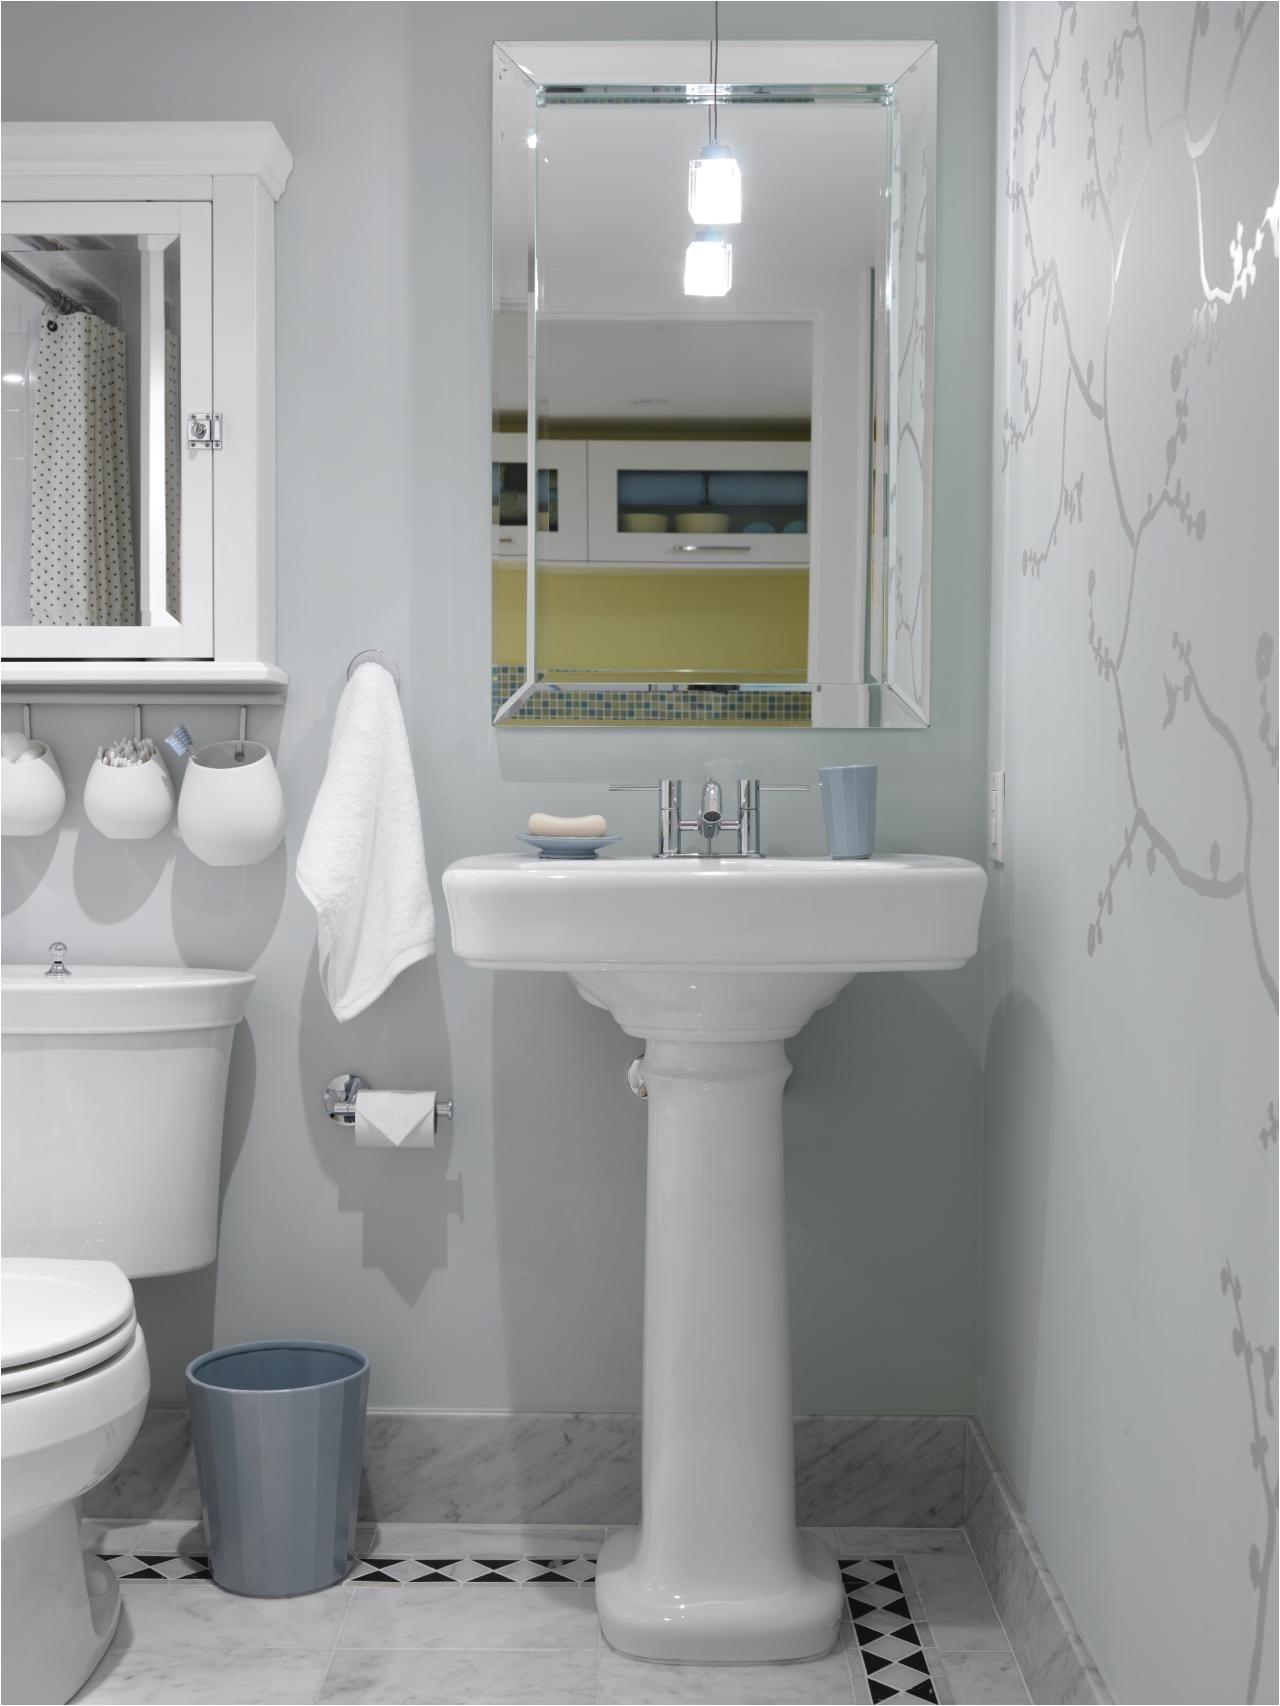 Guest Bathroom with wall decal AH Sarah s House A Mid Century Home